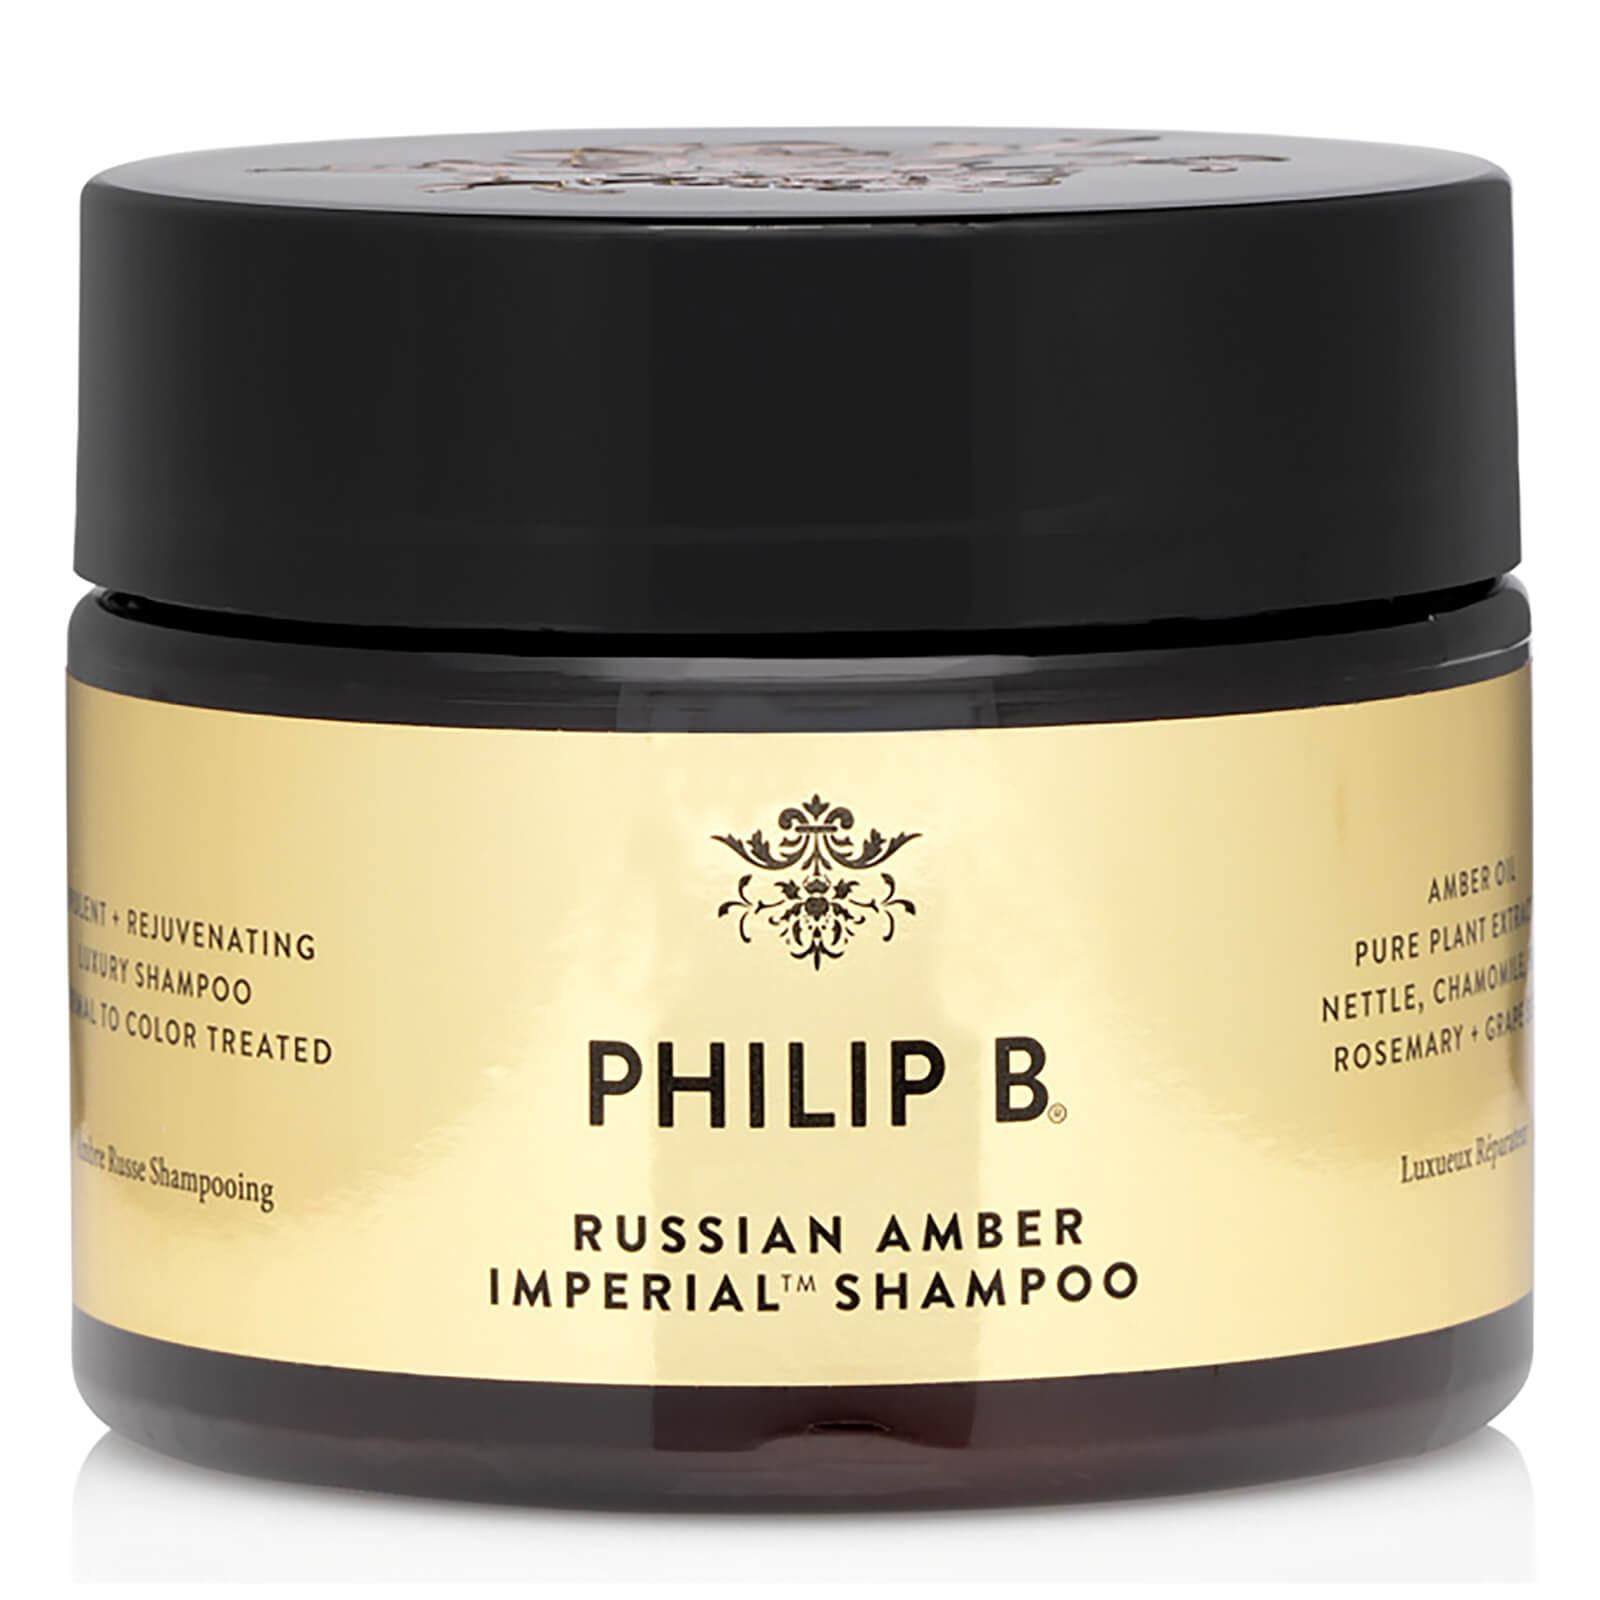 Philip B Russian Amber 俄罗斯皇家琥珀洗发膏 88ml